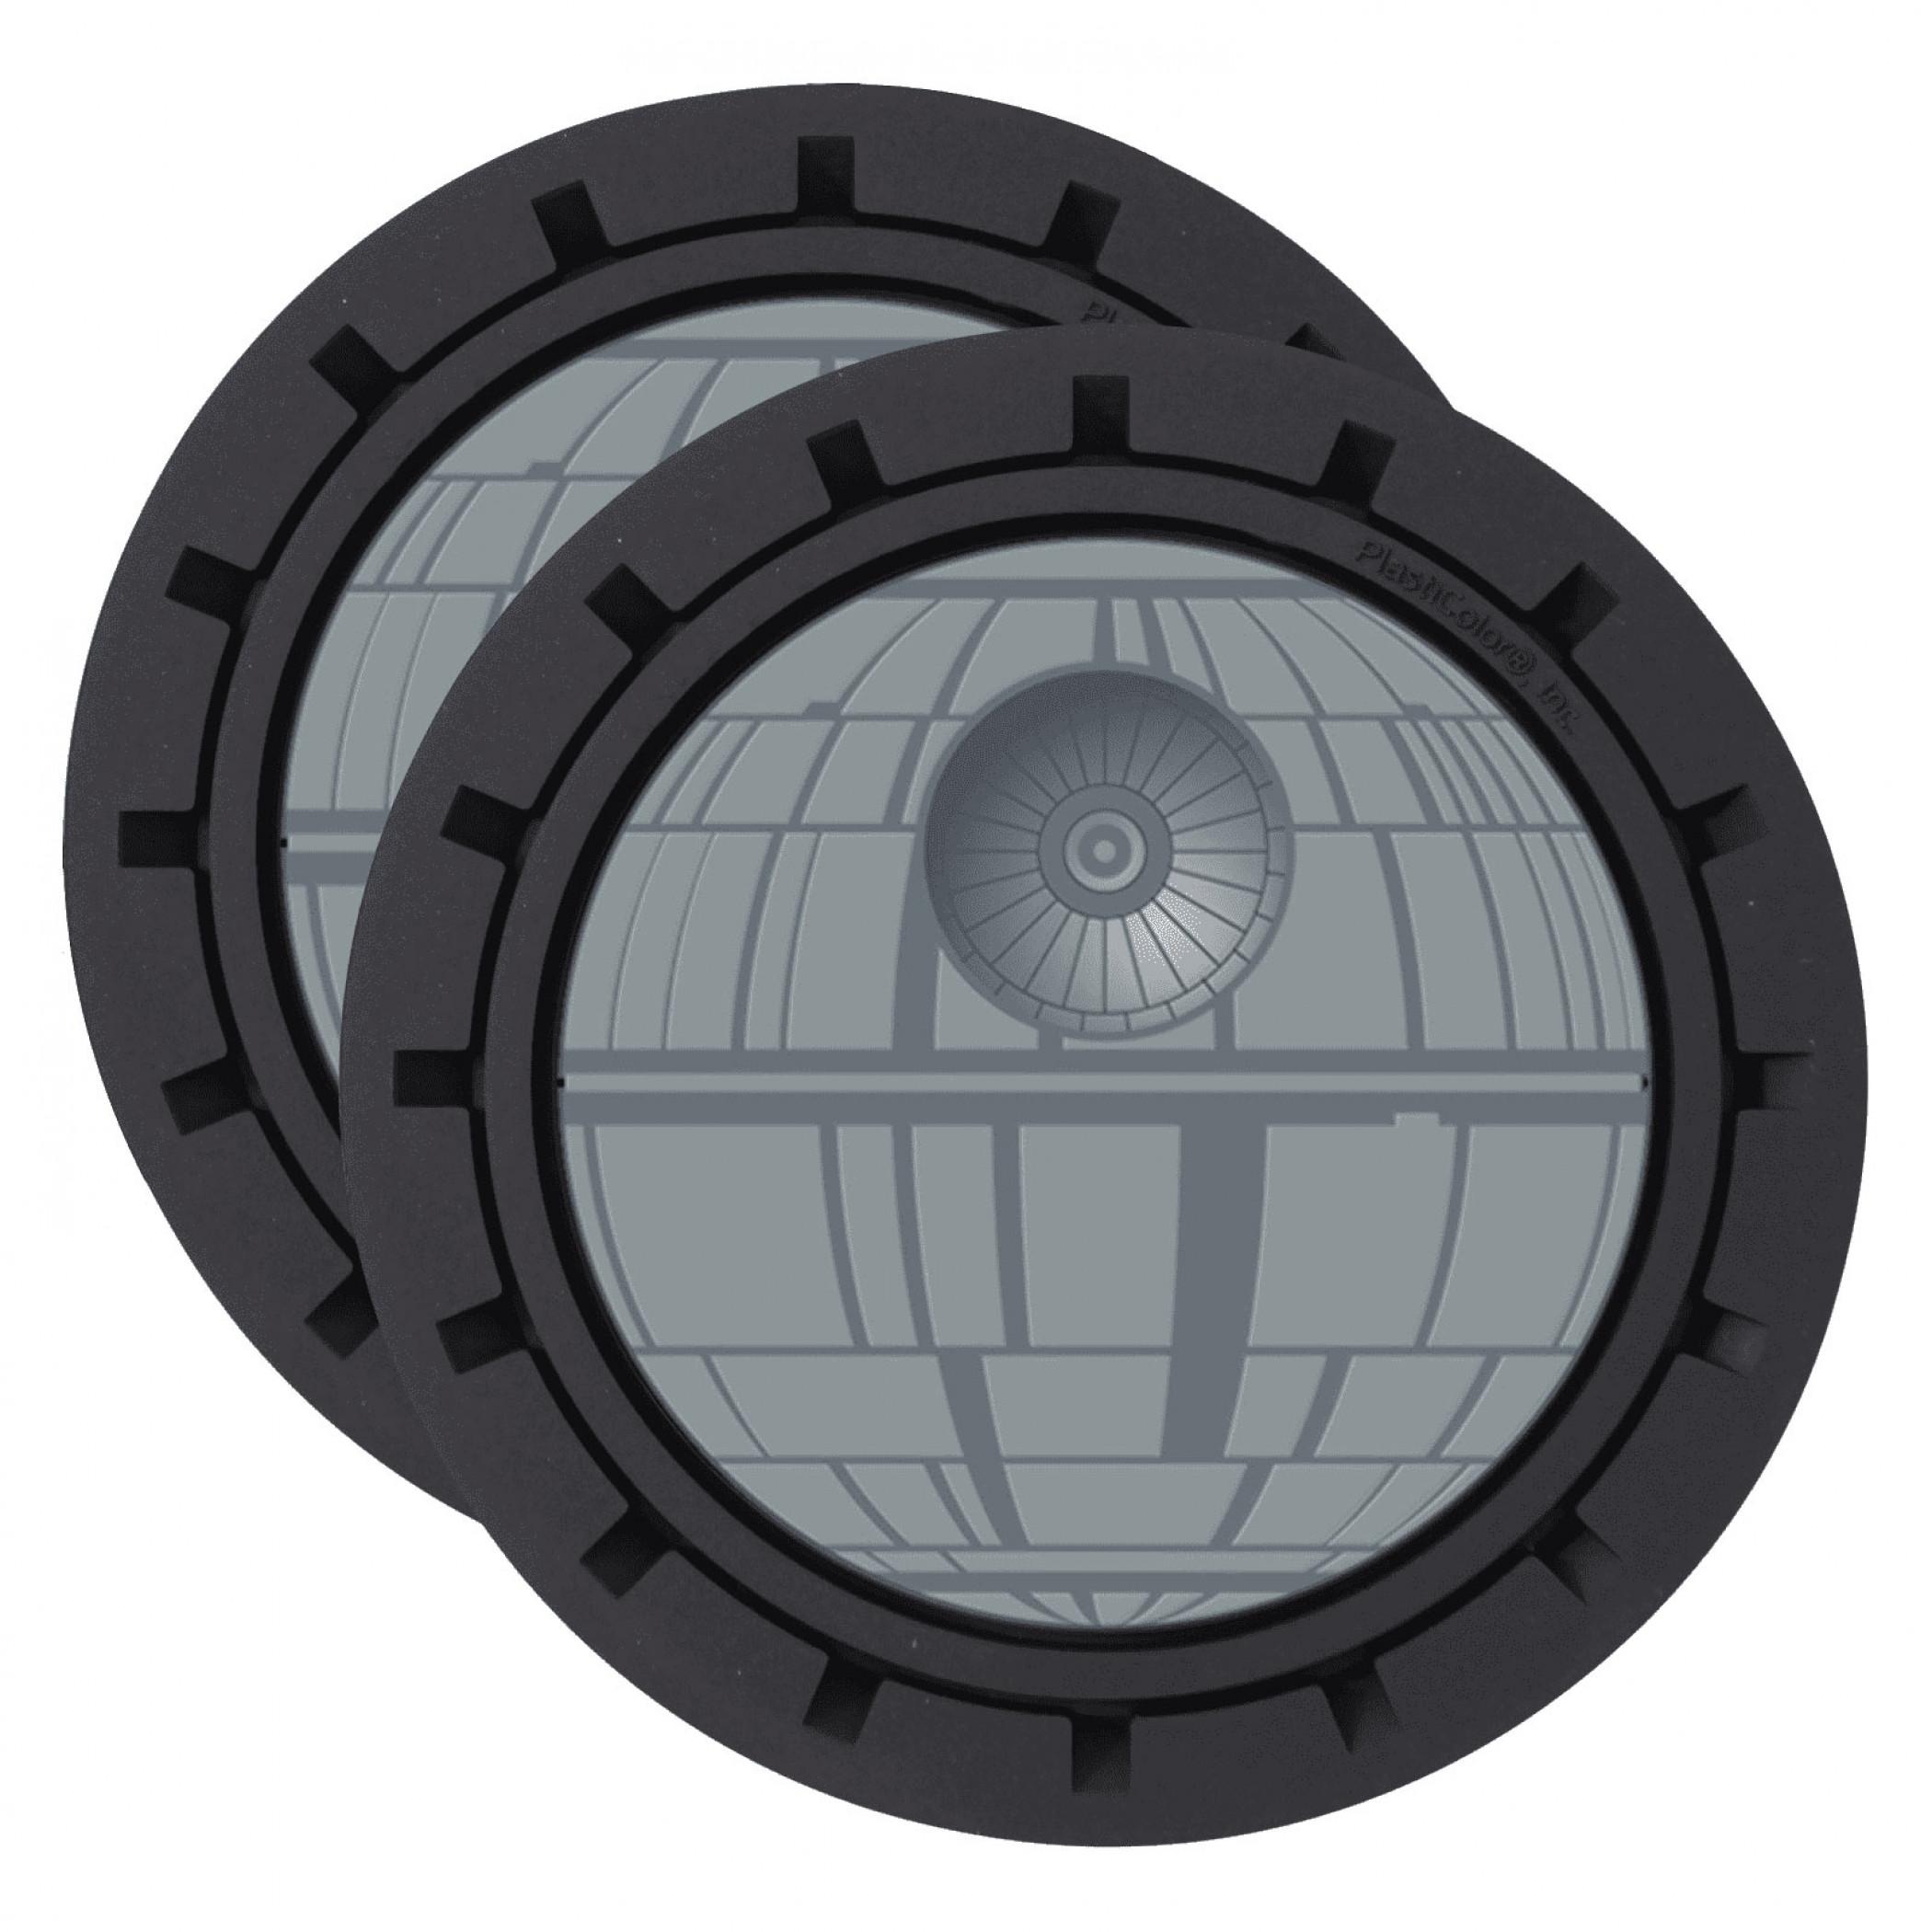 Star Wars Death Star Auto Car Coaster 2-Pack